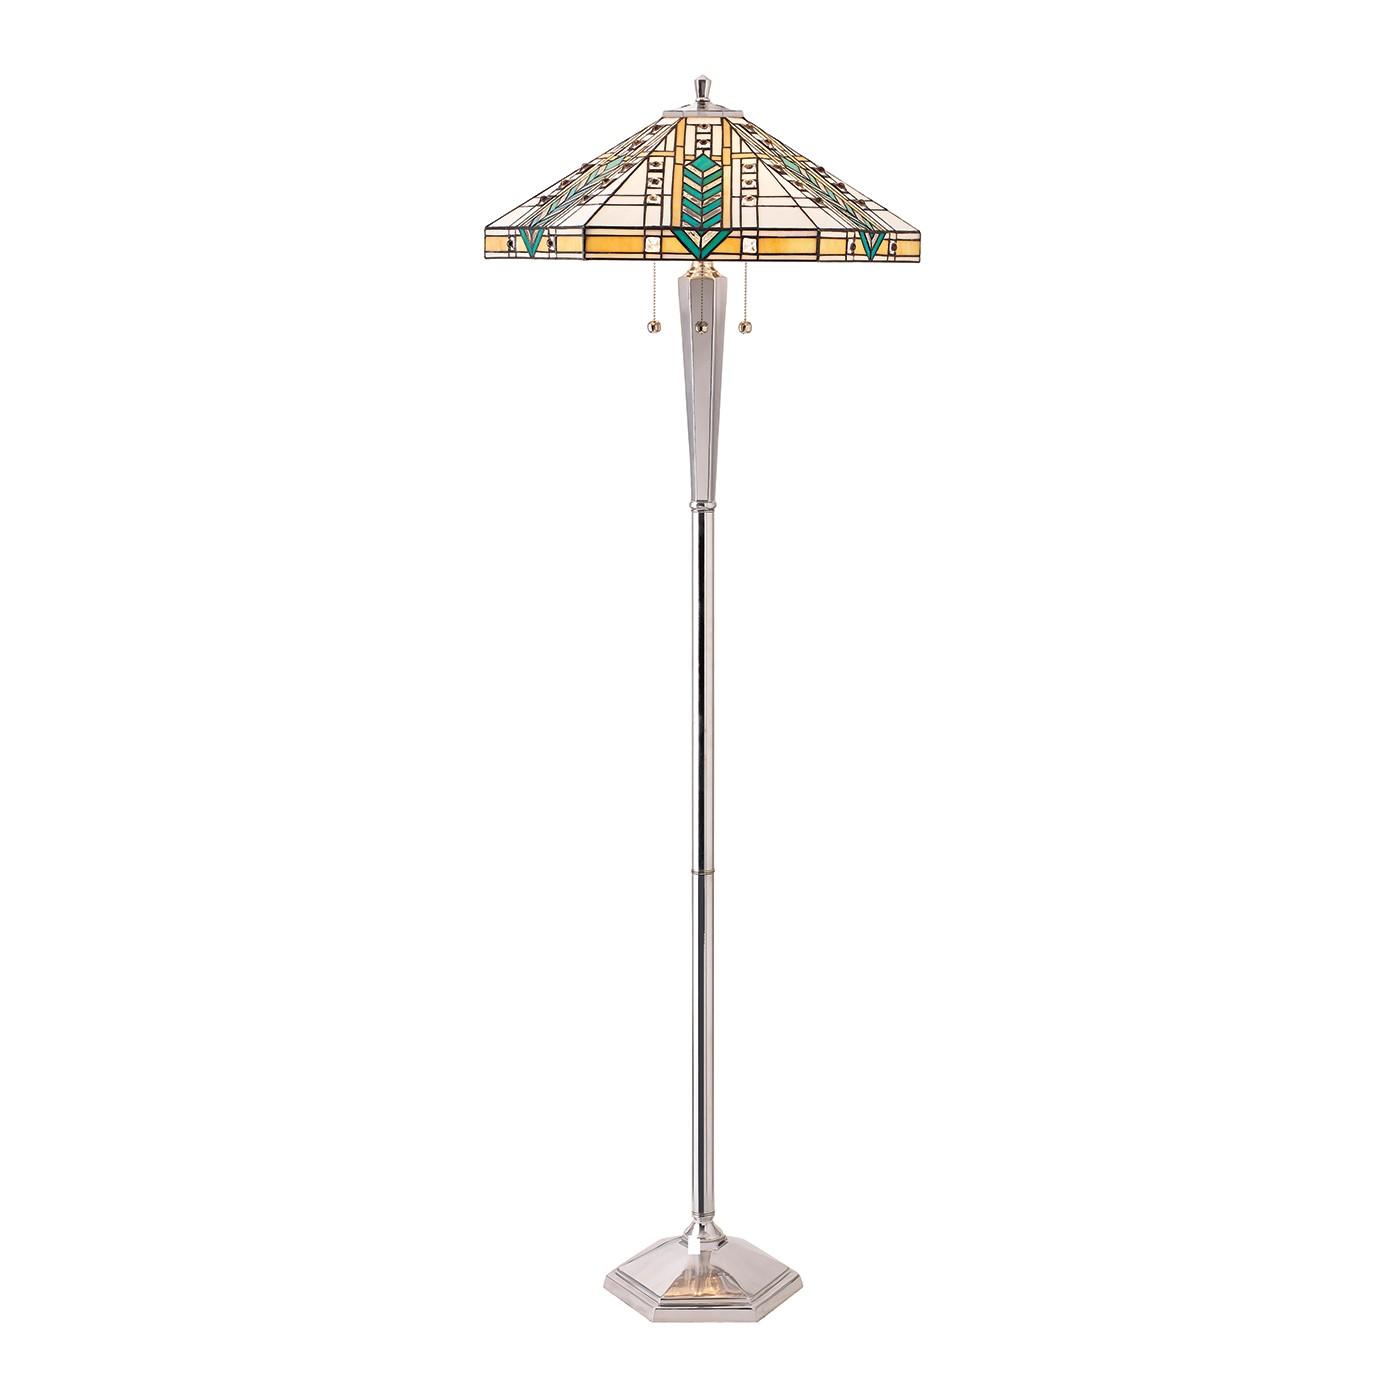 70663 tiffany down 3 light floor lamp aluminium lighting bug swindon. Black Bedroom Furniture Sets. Home Design Ideas